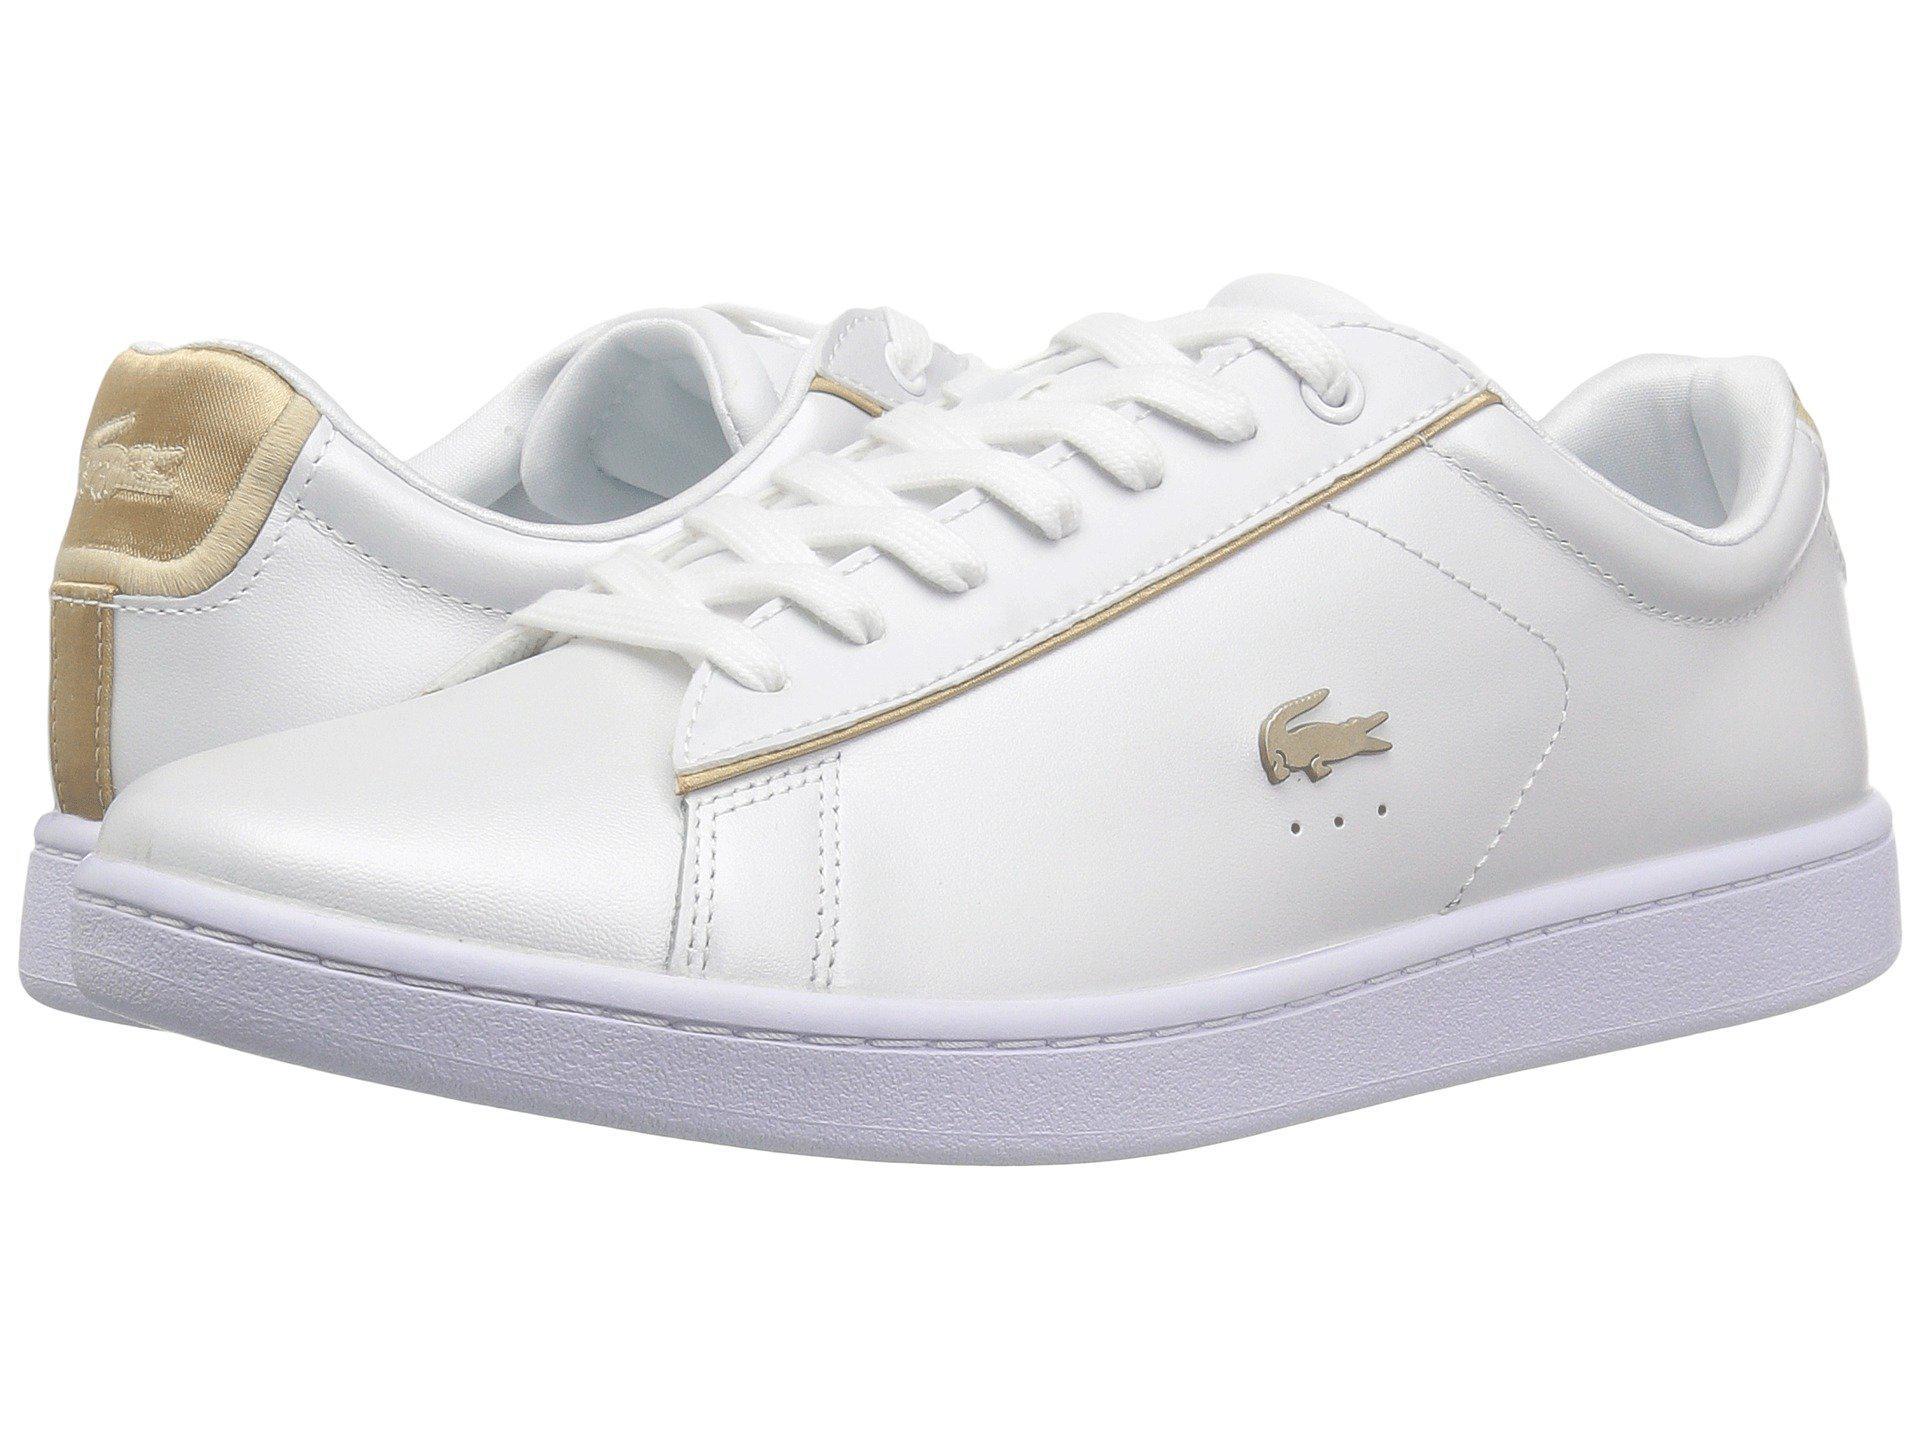 Lacoste Carnaby Evo 118 6 Spw Sneaker